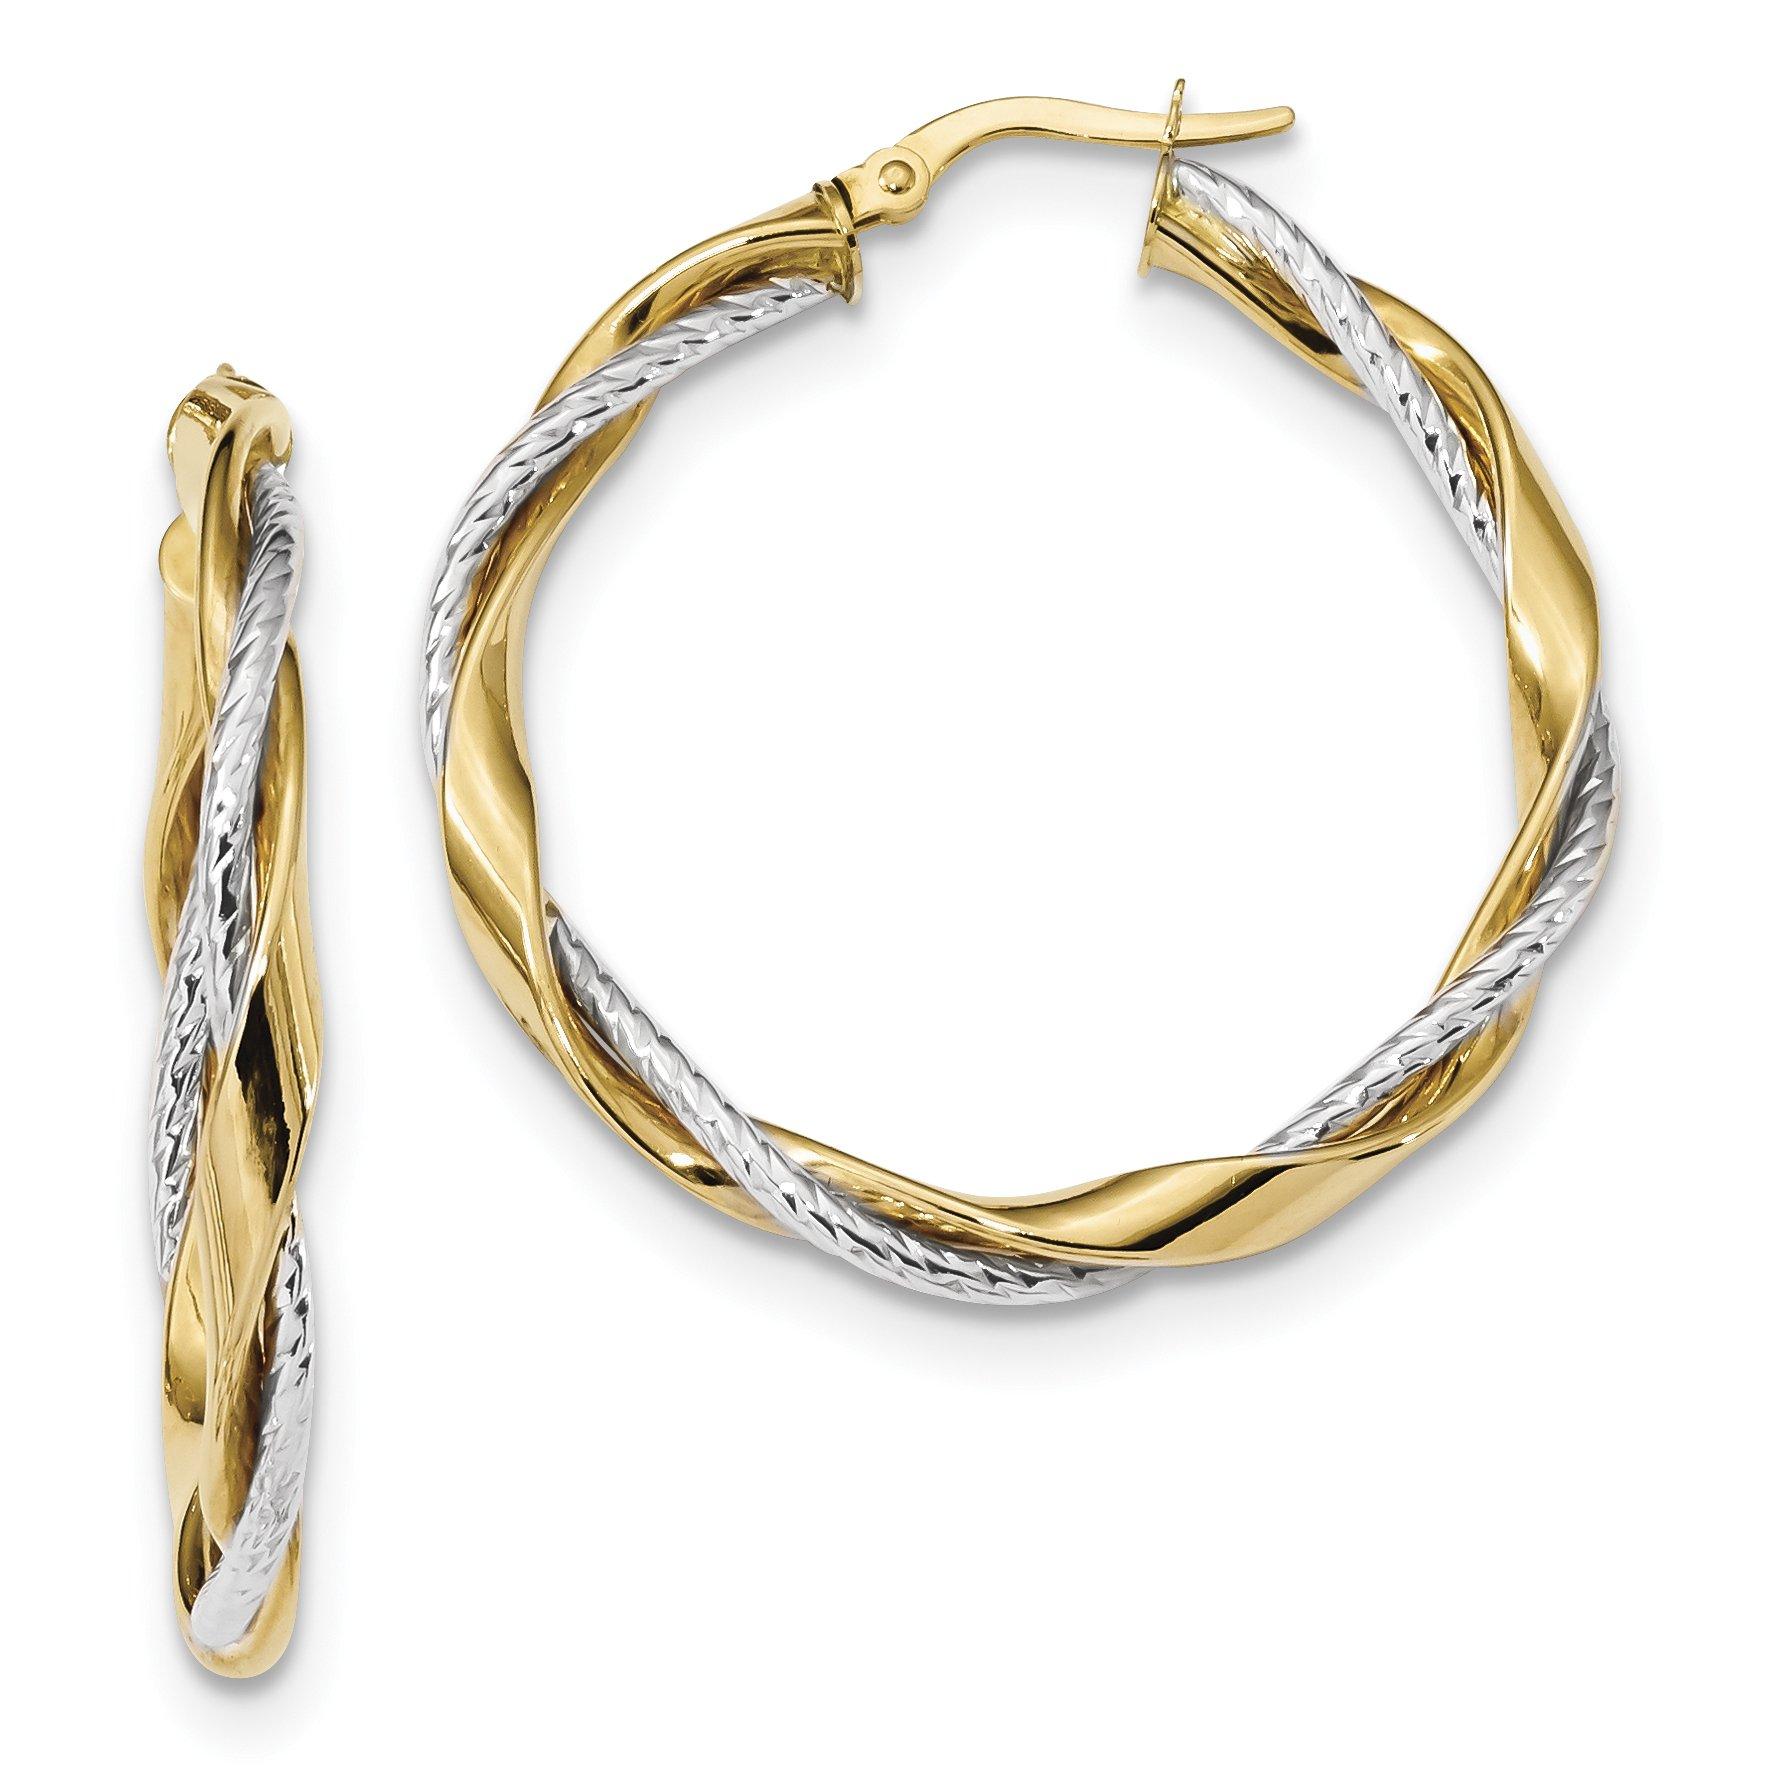 ICE CARATS 14k Two Tone Yellow Gold Rope Twisted Hoop Earrings Ear Hoops Set Fine Jewelry Gift Set For Women Heart